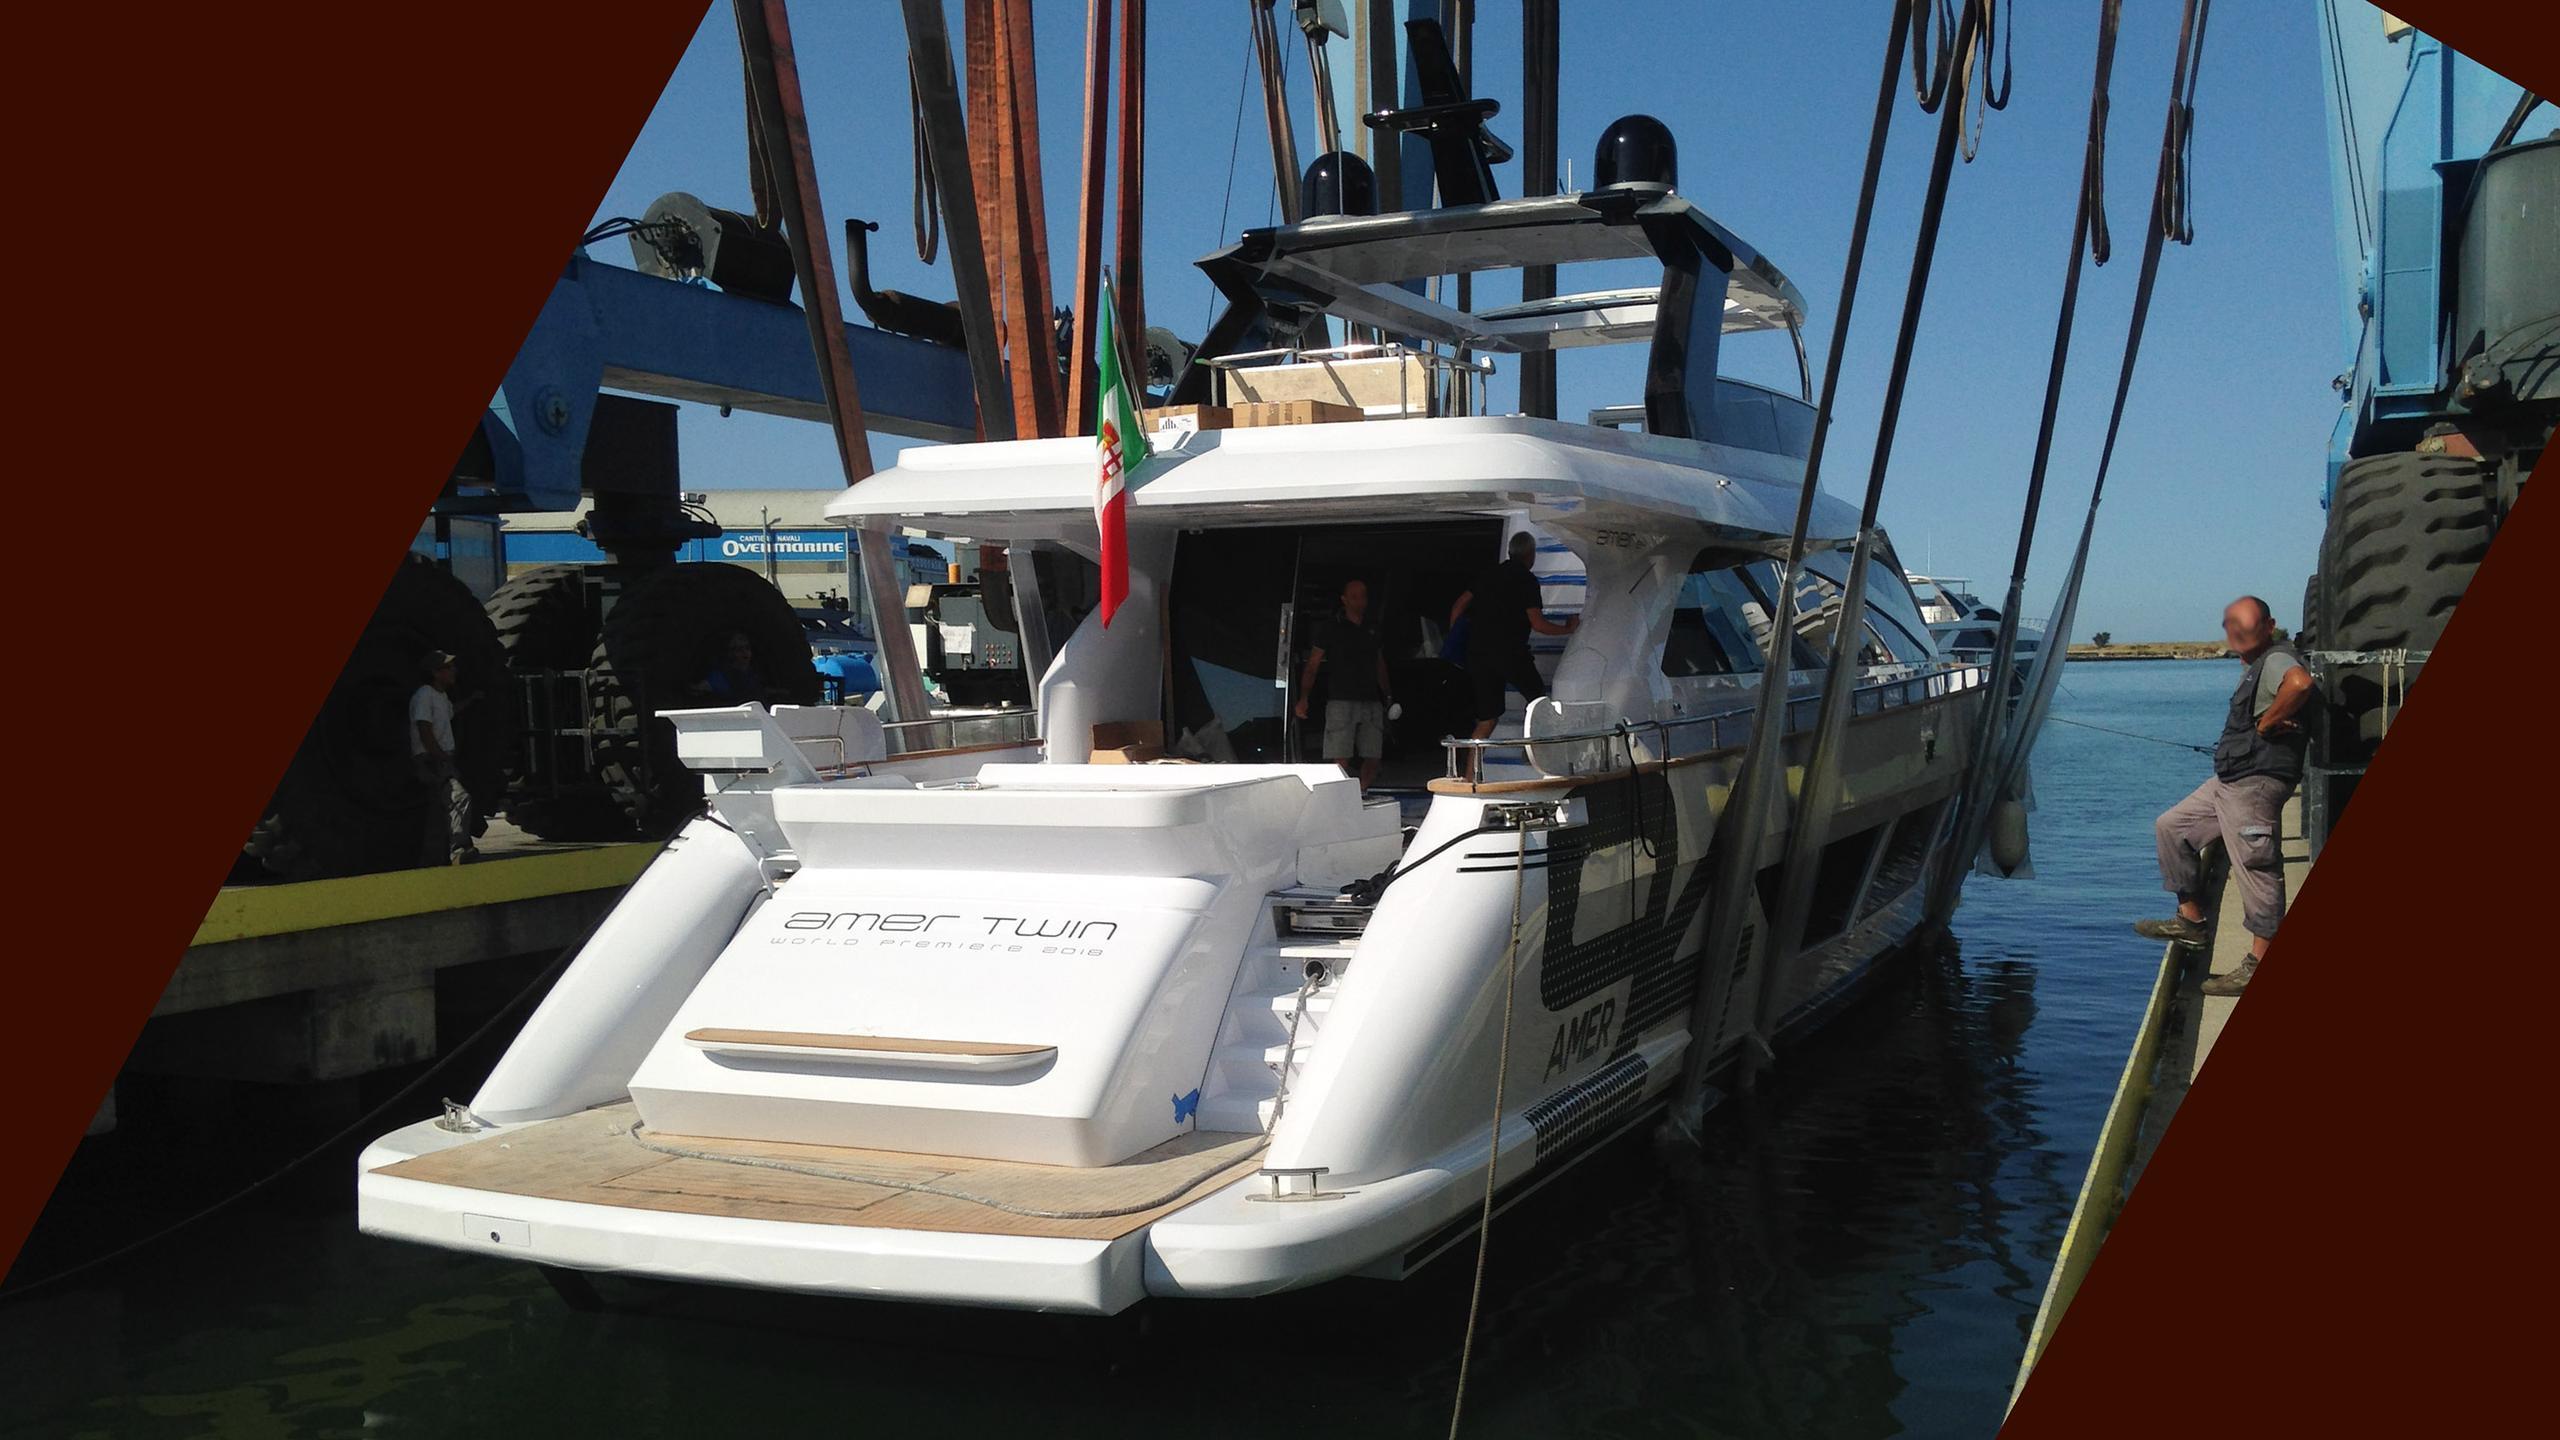 amer 94 hull 15 motoryacht permare 2018 28m launch stern